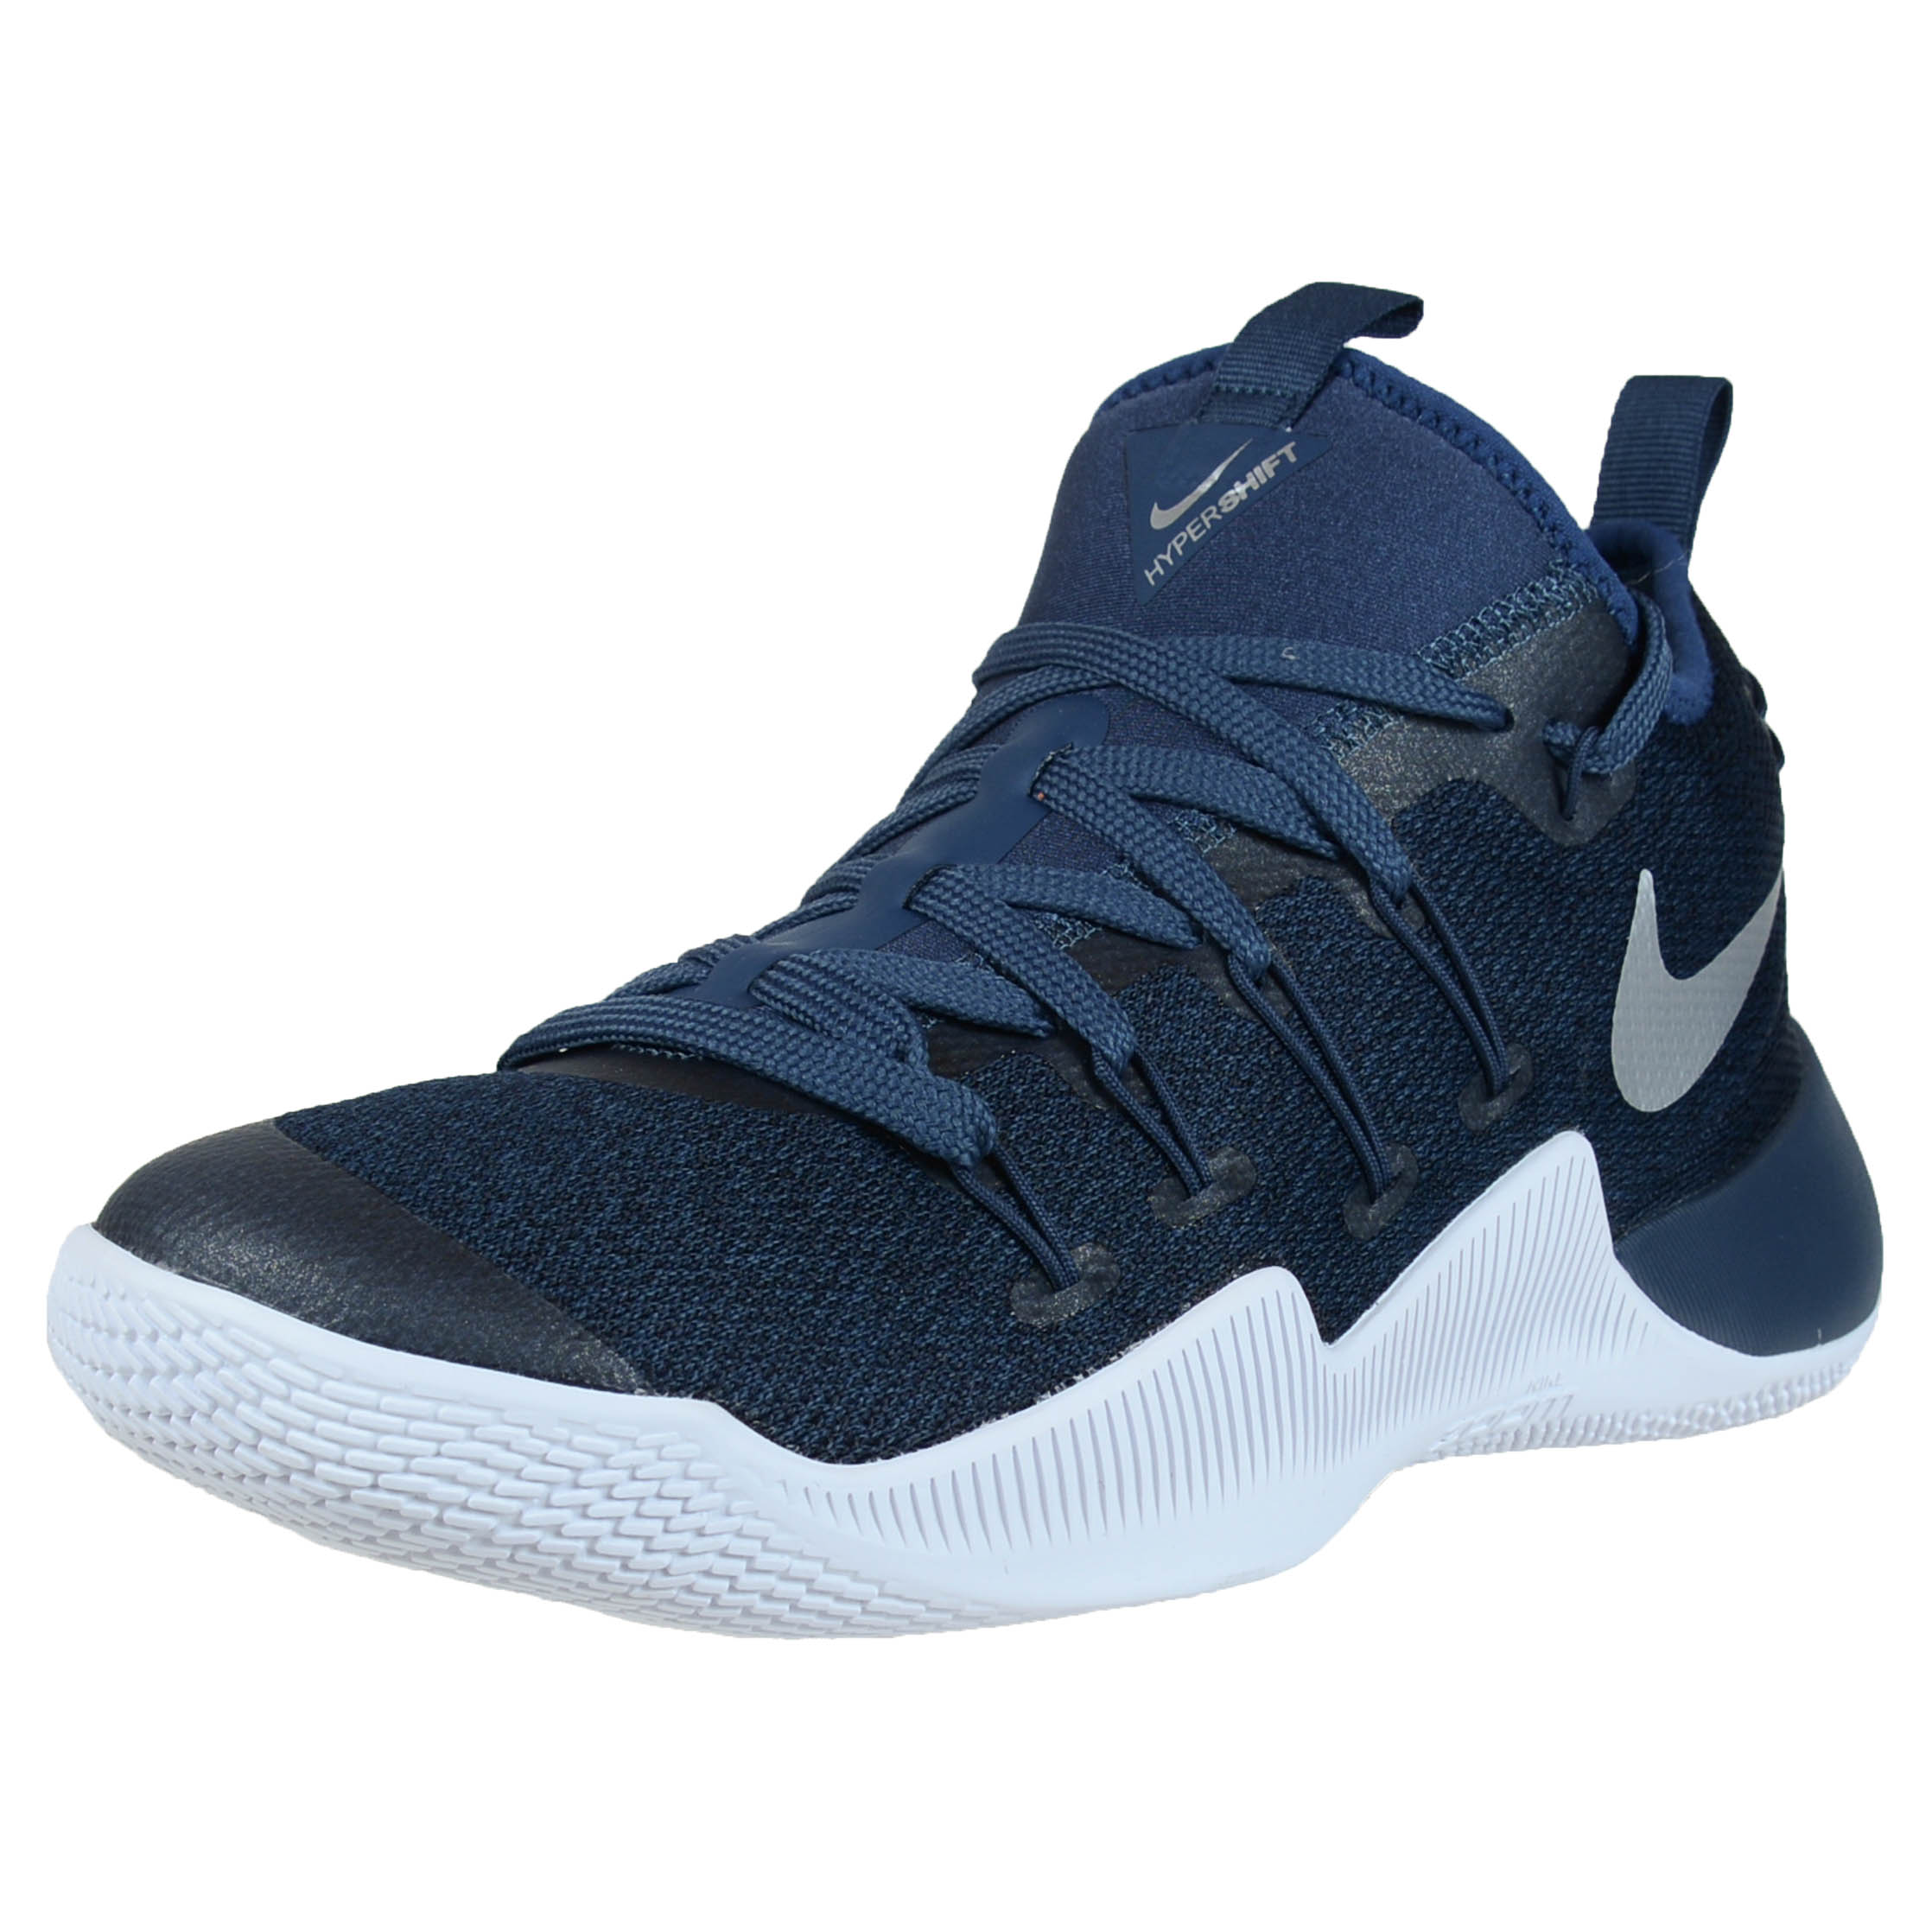 864ed8dfe3a4 ... cheap nike hypershift basketball shoes squadron blue metallic silver  844369 410 964b0 32344